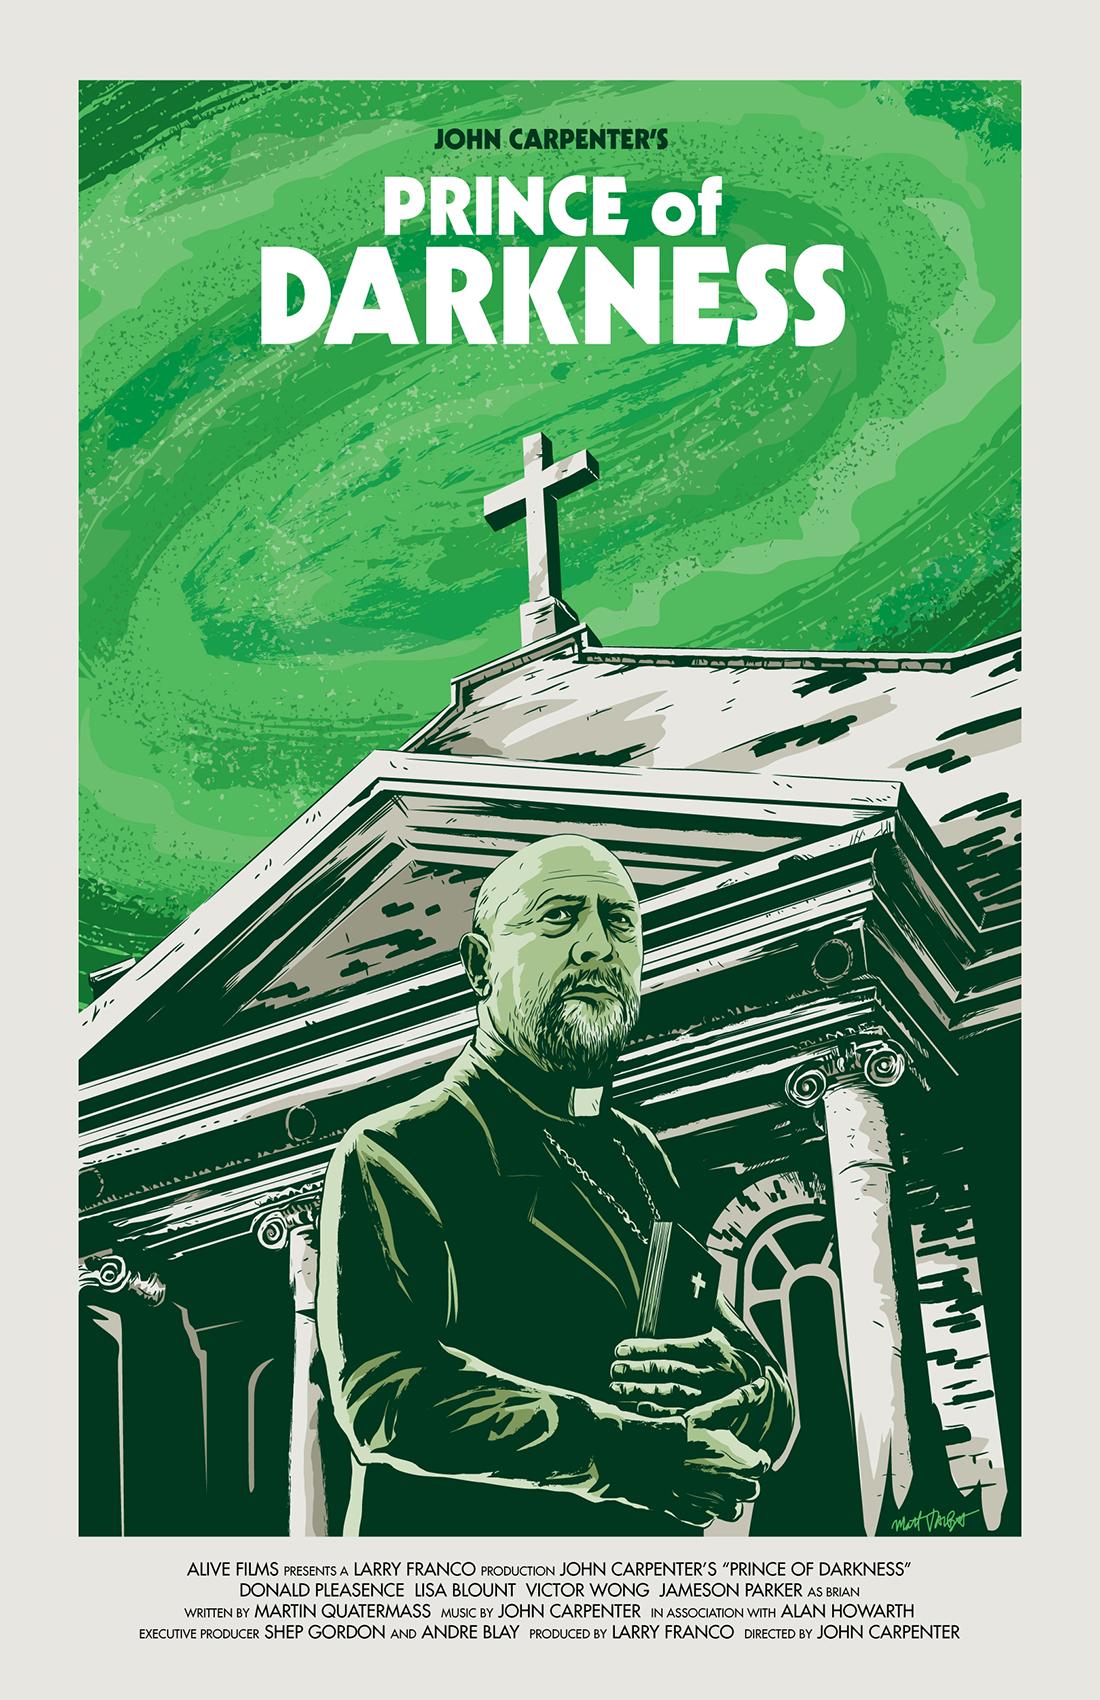 John Carpenter's Prince of Darkness poster by Matt Talbot